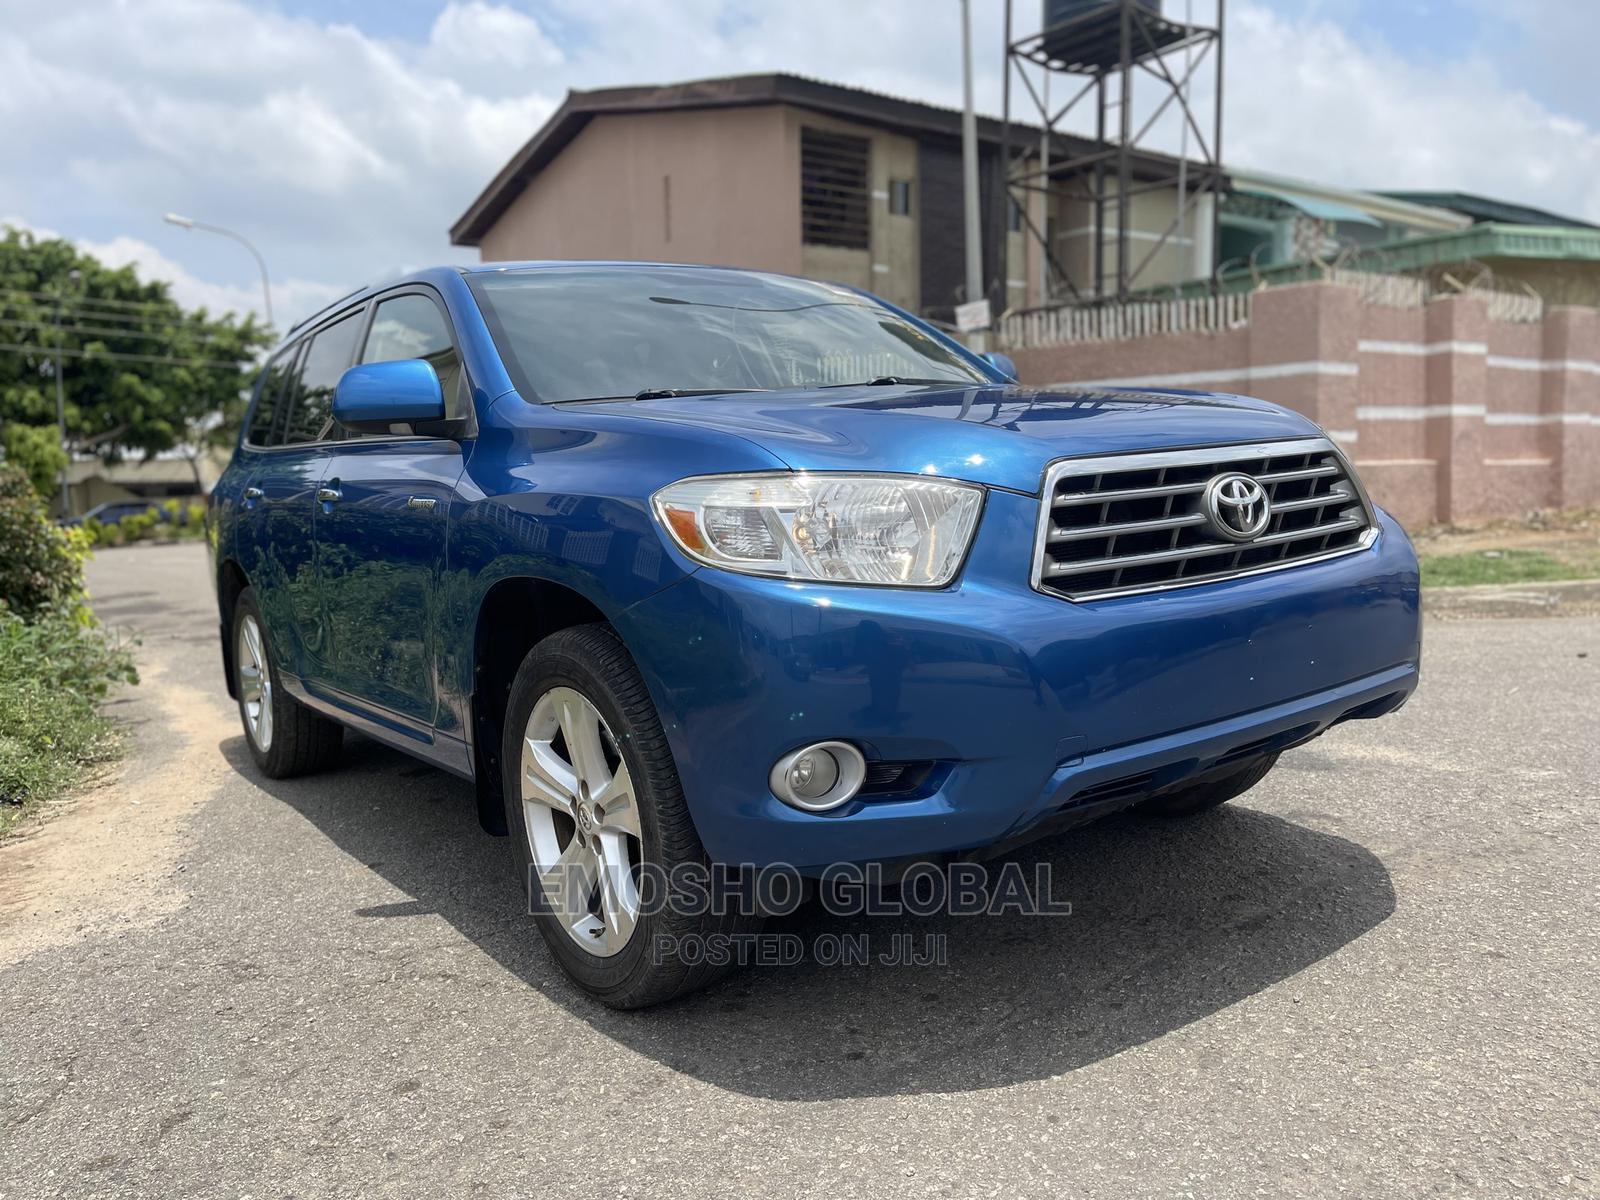 Archive: Toyota Highlander 2008 Limited Blue